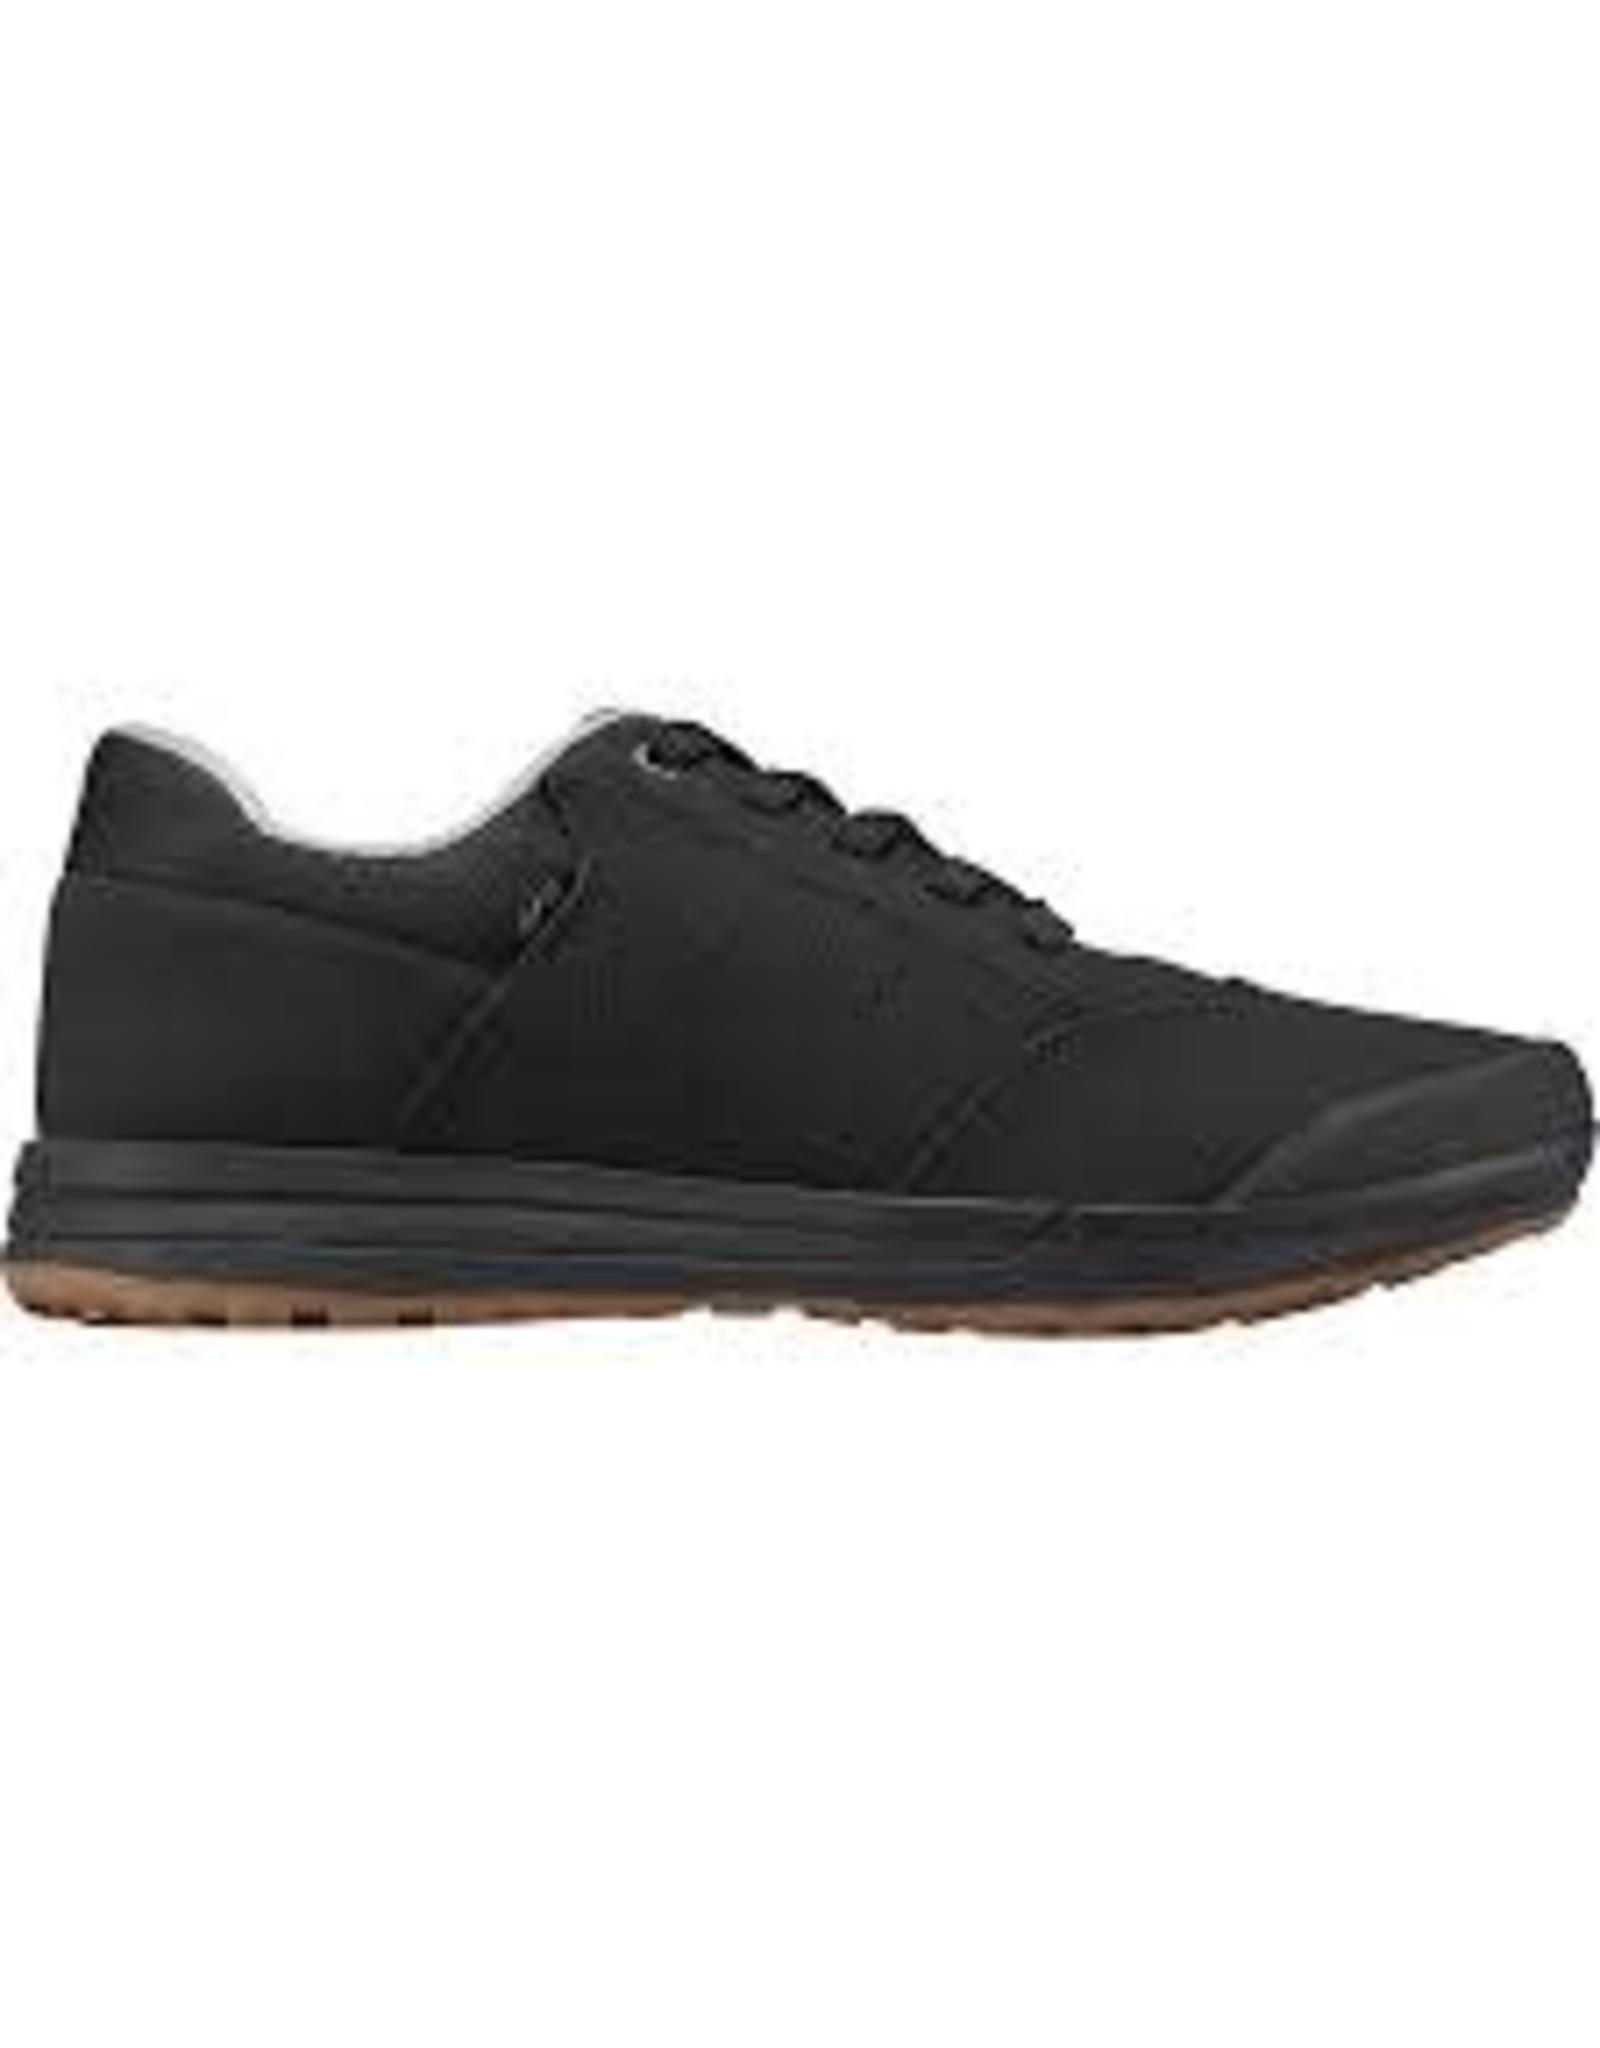 Specialized Shoe Spec 2FO Roost Flat Blk 47